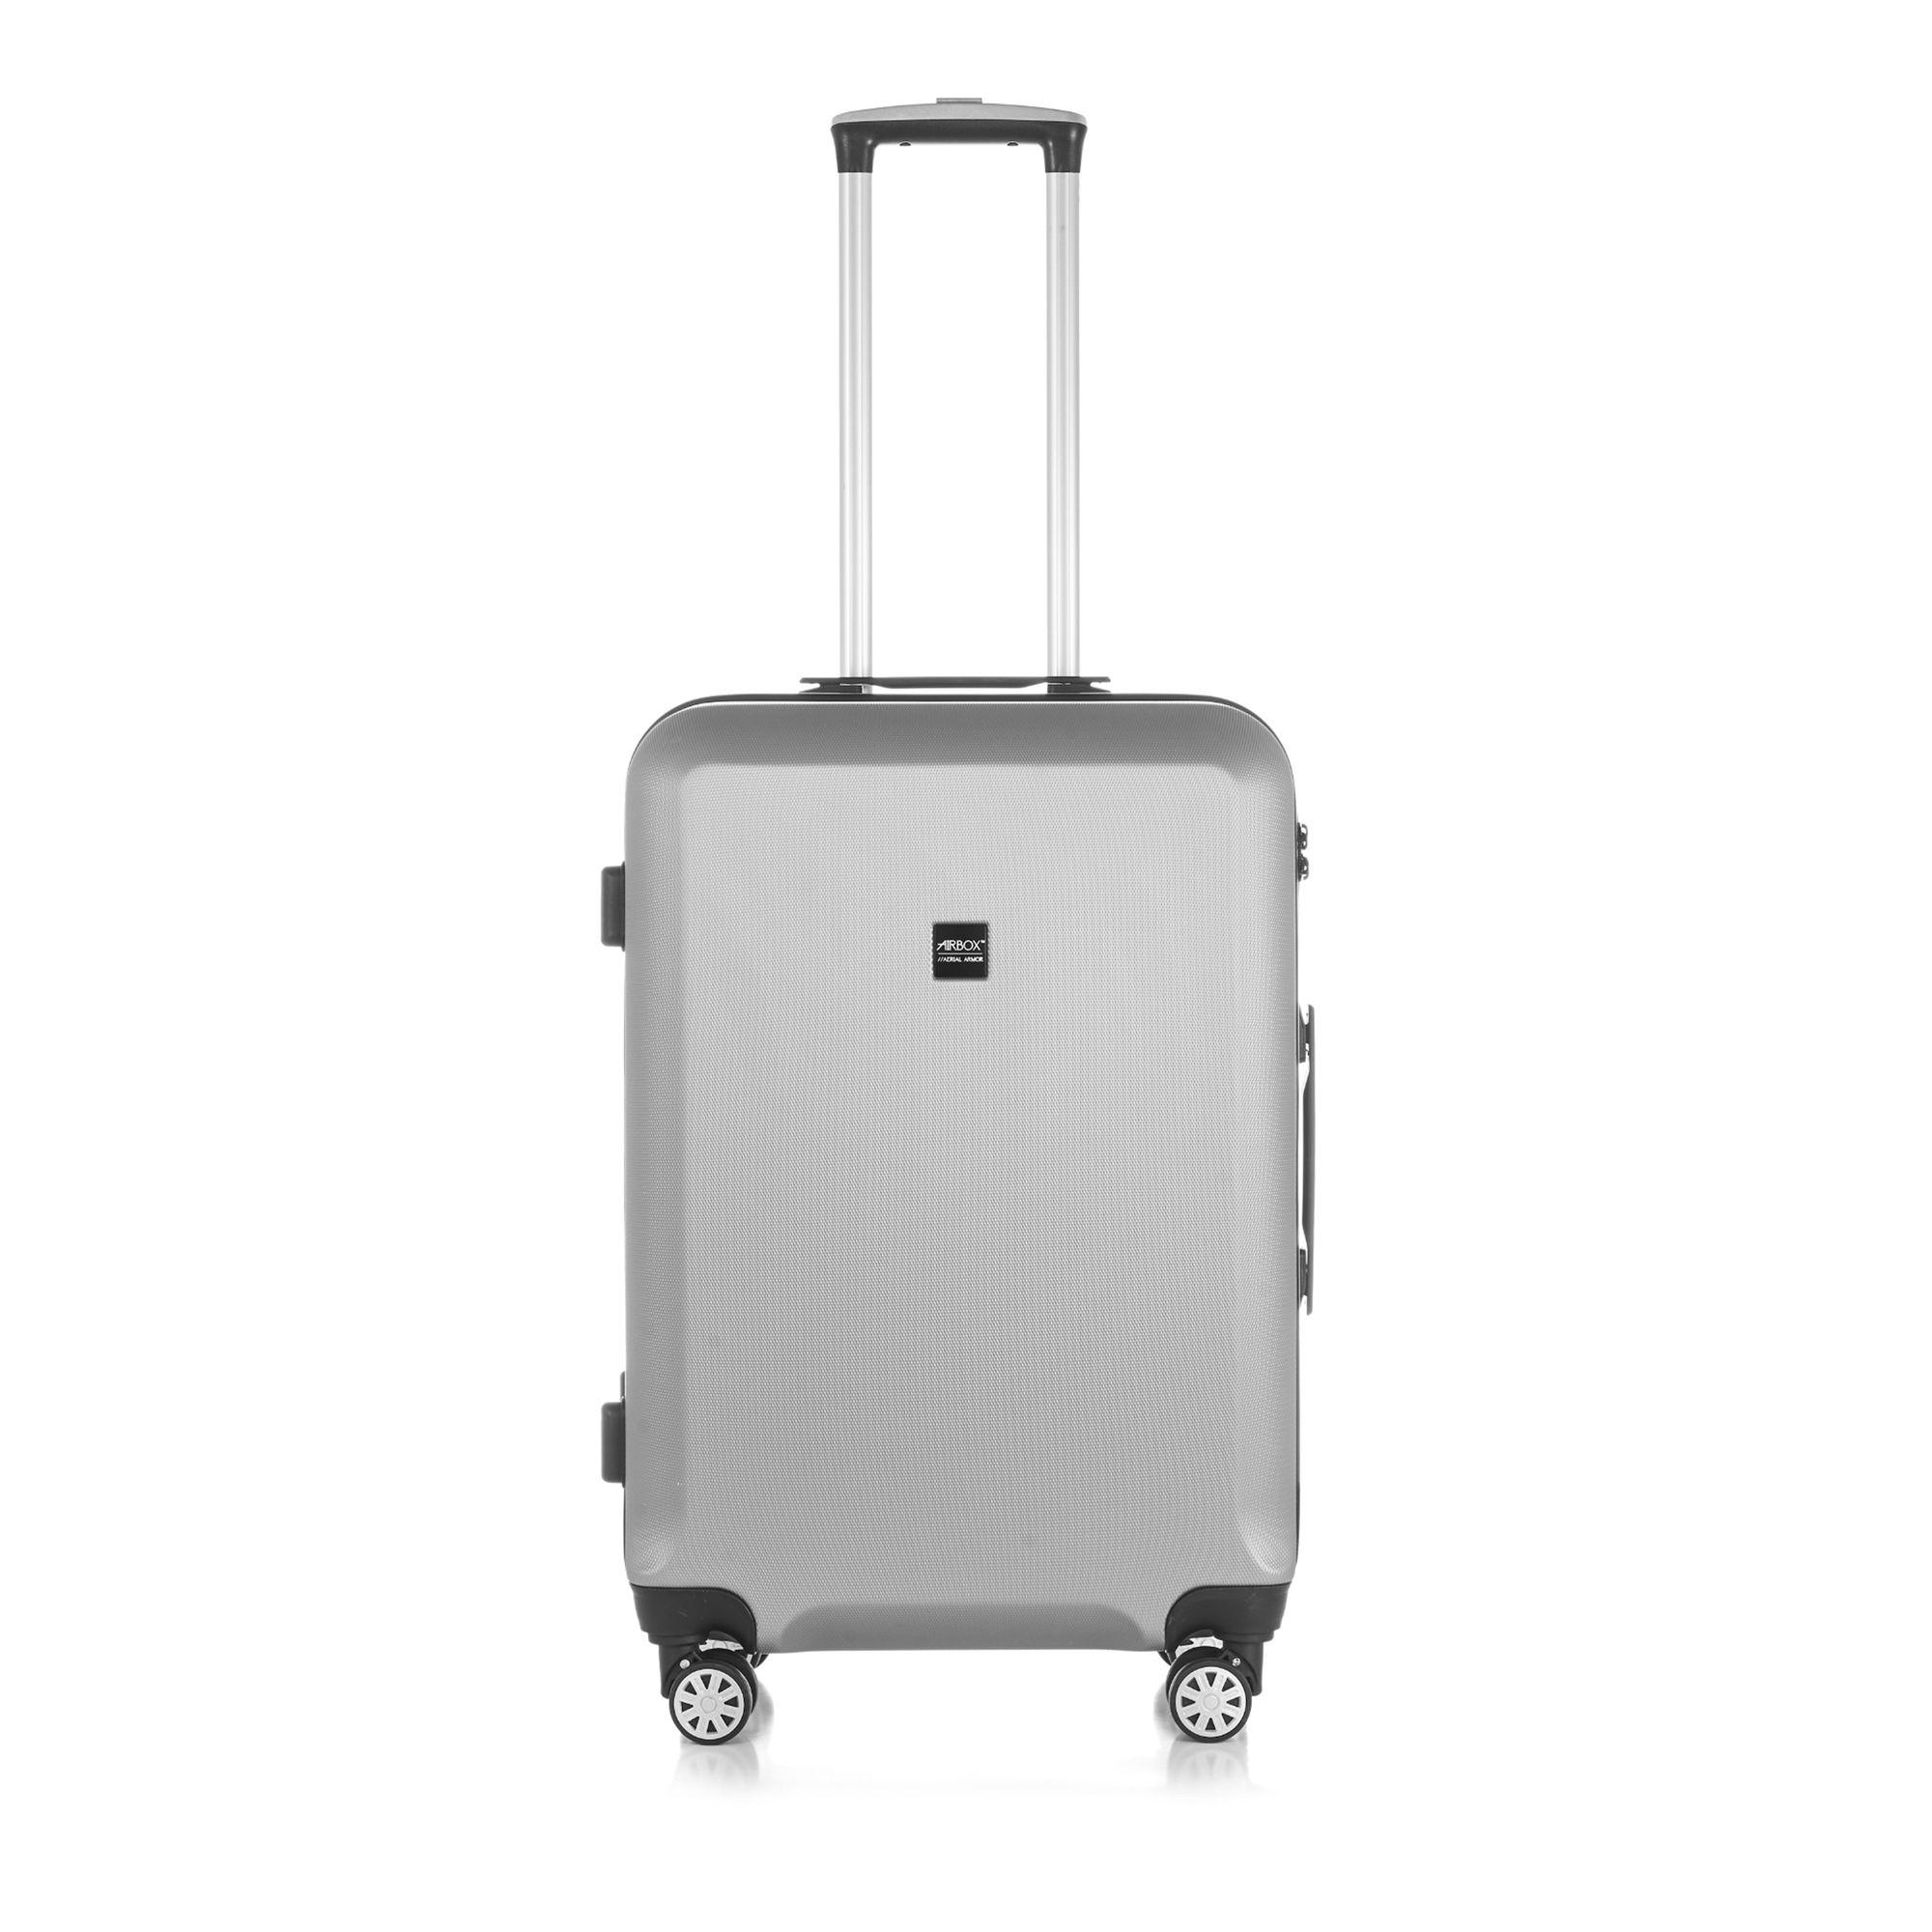 Bilde av Airbox Az8 Hard Koffert Med 4 Hjul, 55/65/75 Cm, Sølv, 65cm